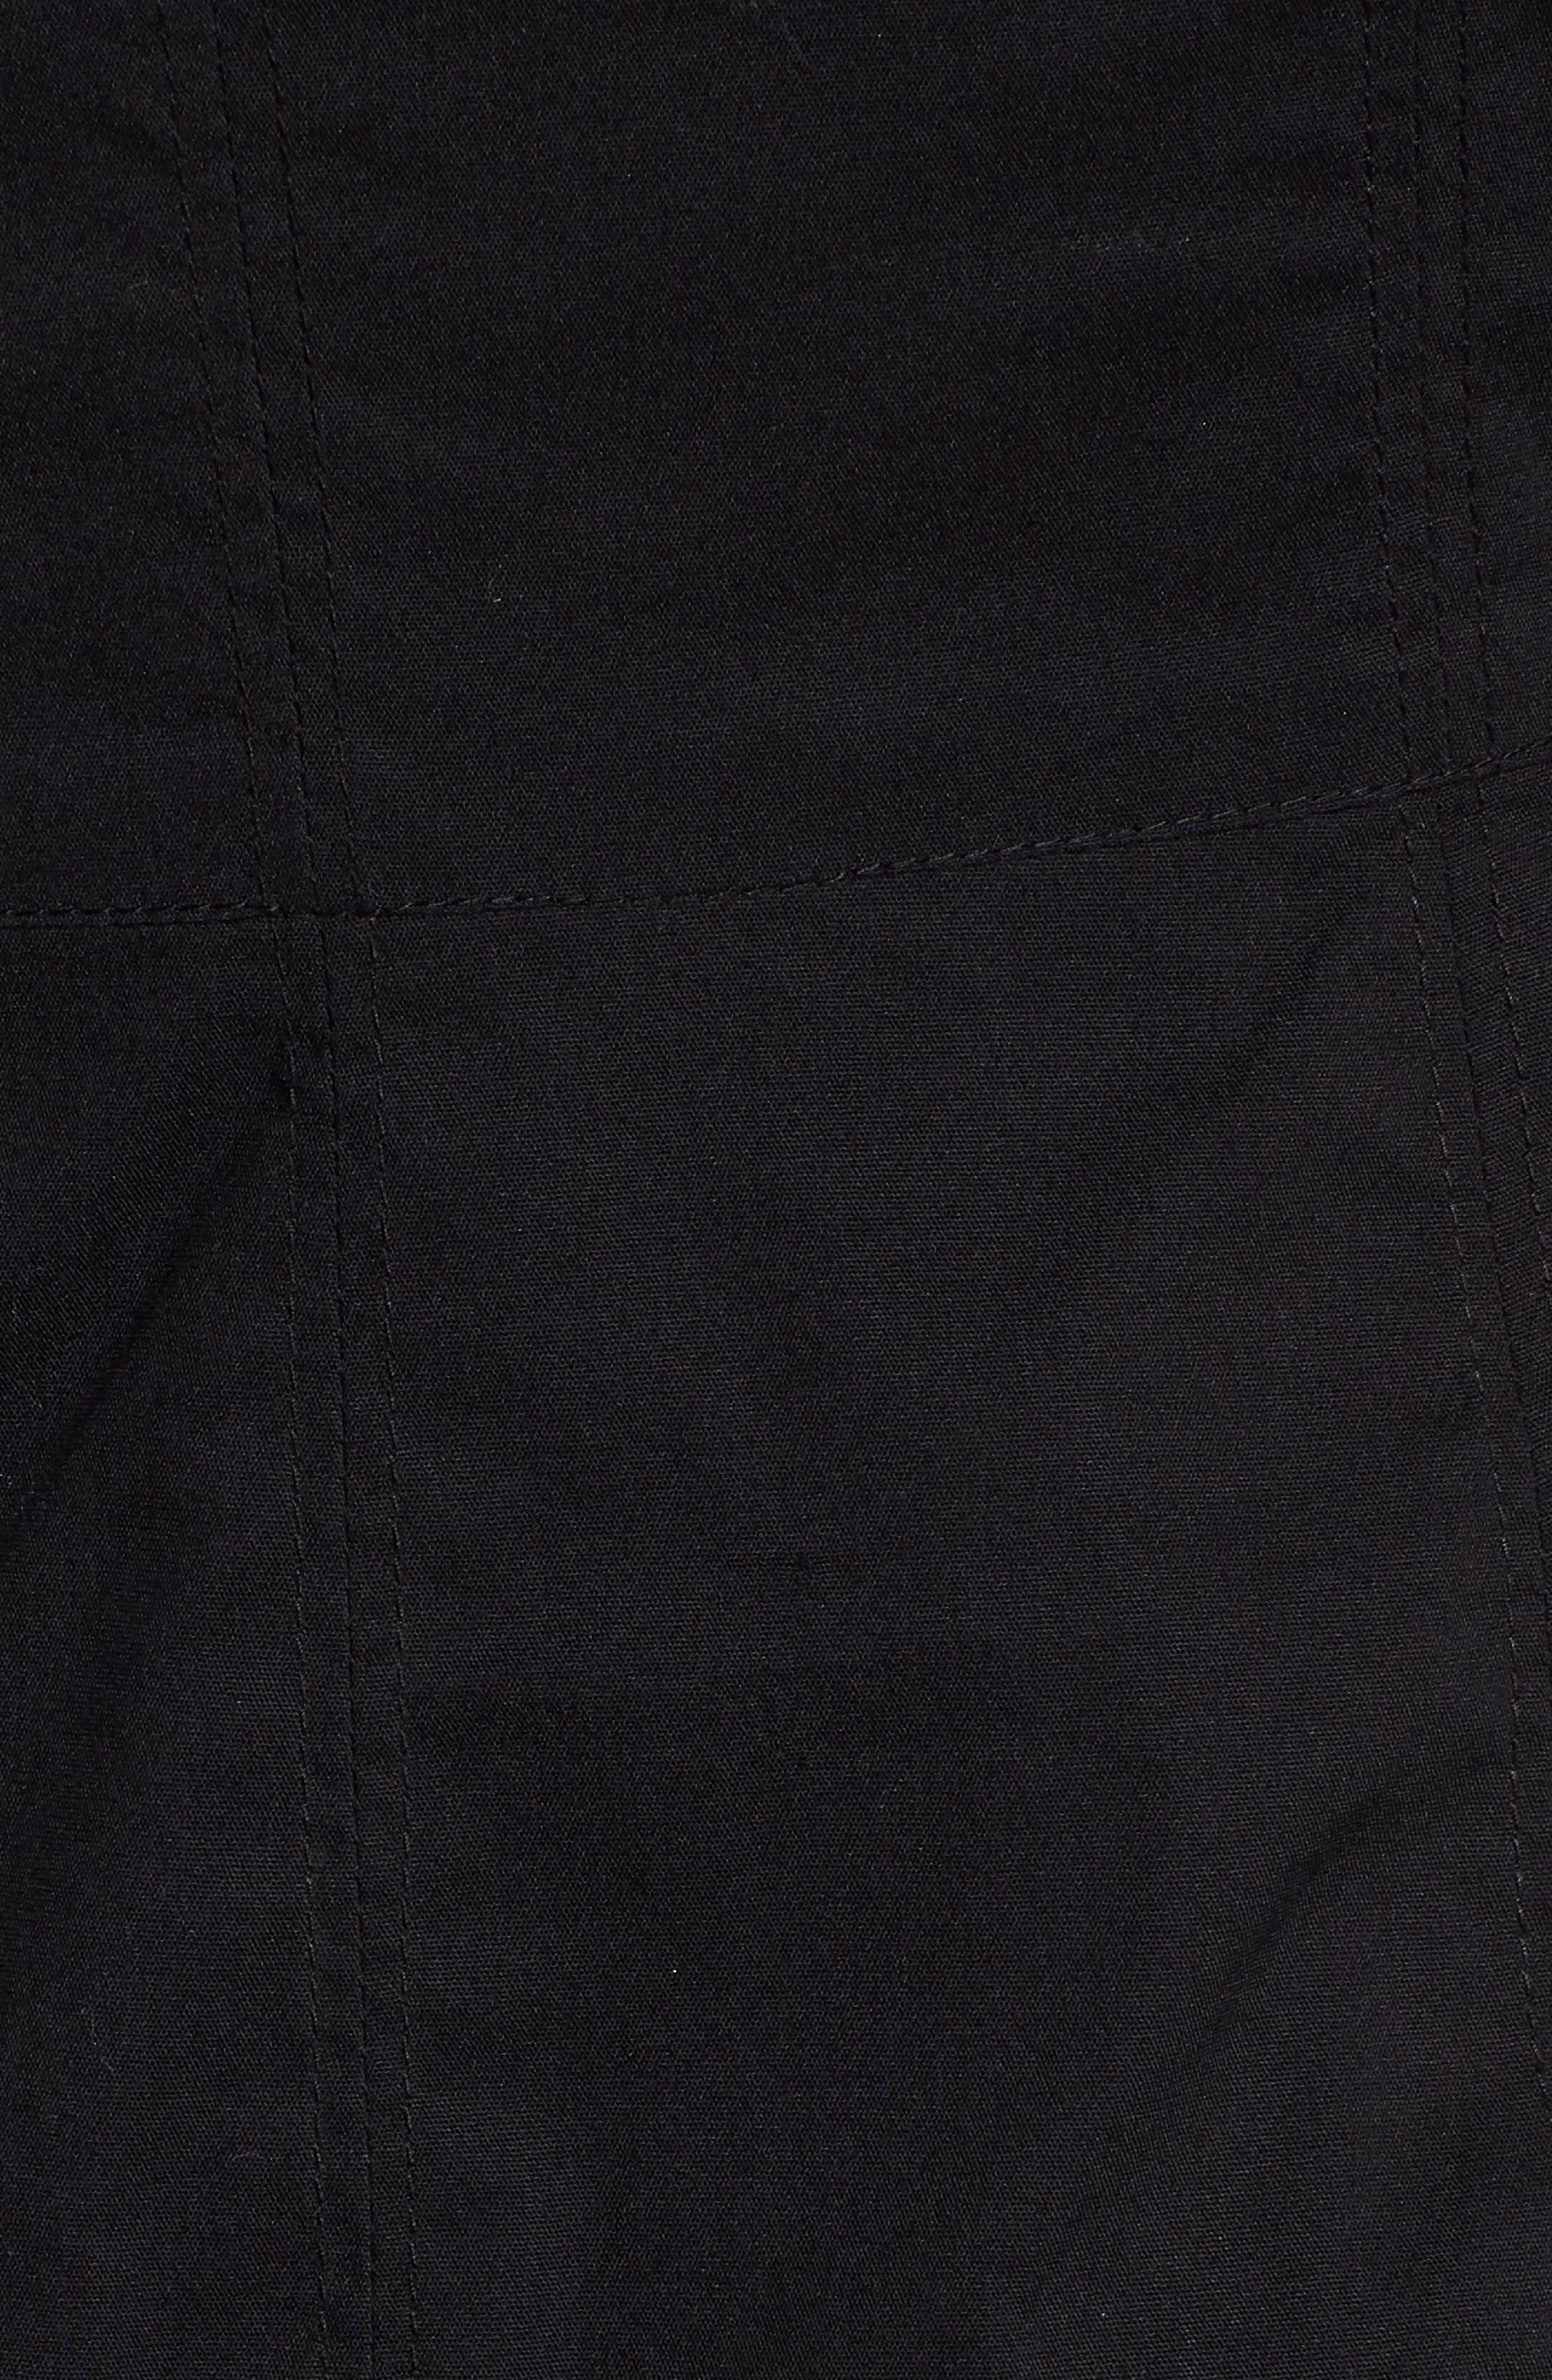 Ruffle One-Shoulder Dress,                             Alternate thumbnail 7, color,                             001